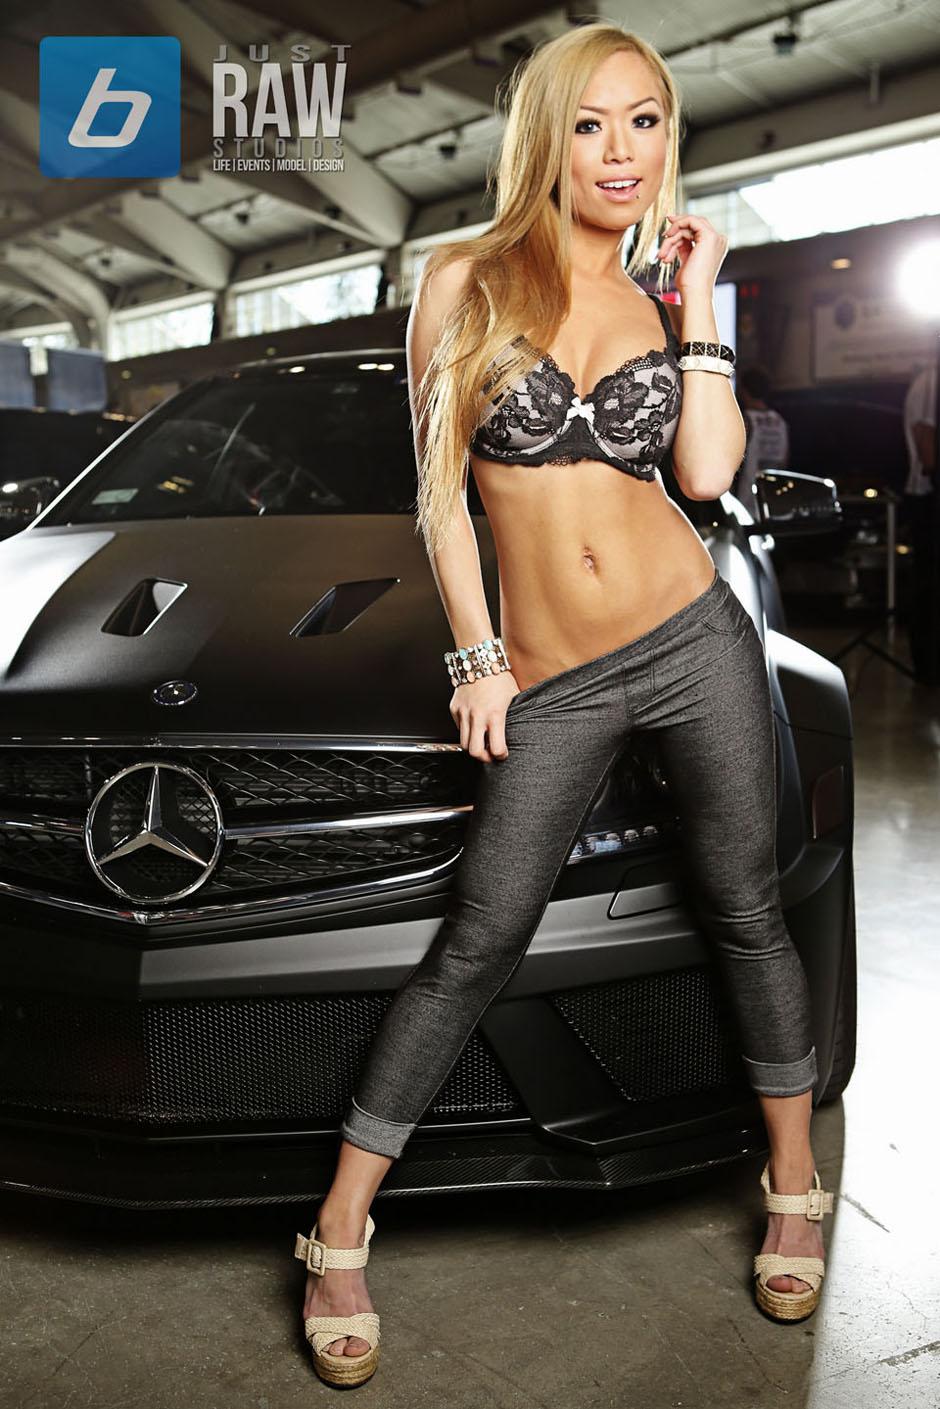 Car Show Girls Beyondca - Car show models